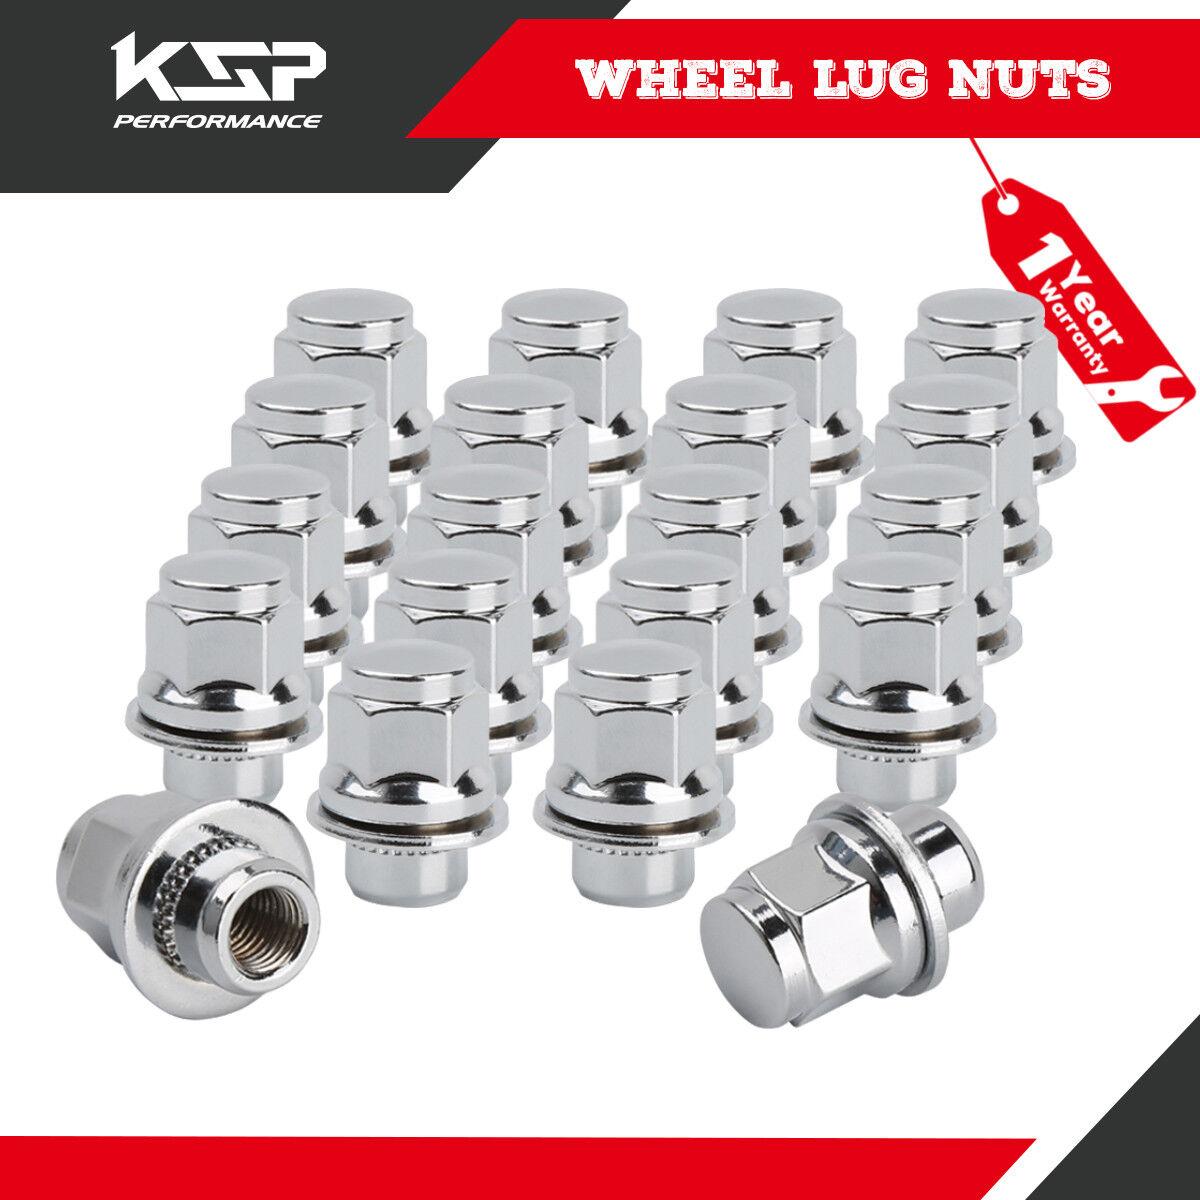 Socket Key 24 Pc Chrome Spike Acorn Seat Lug Nuts M12x1.5 6x5.5 Tundra Tacoma